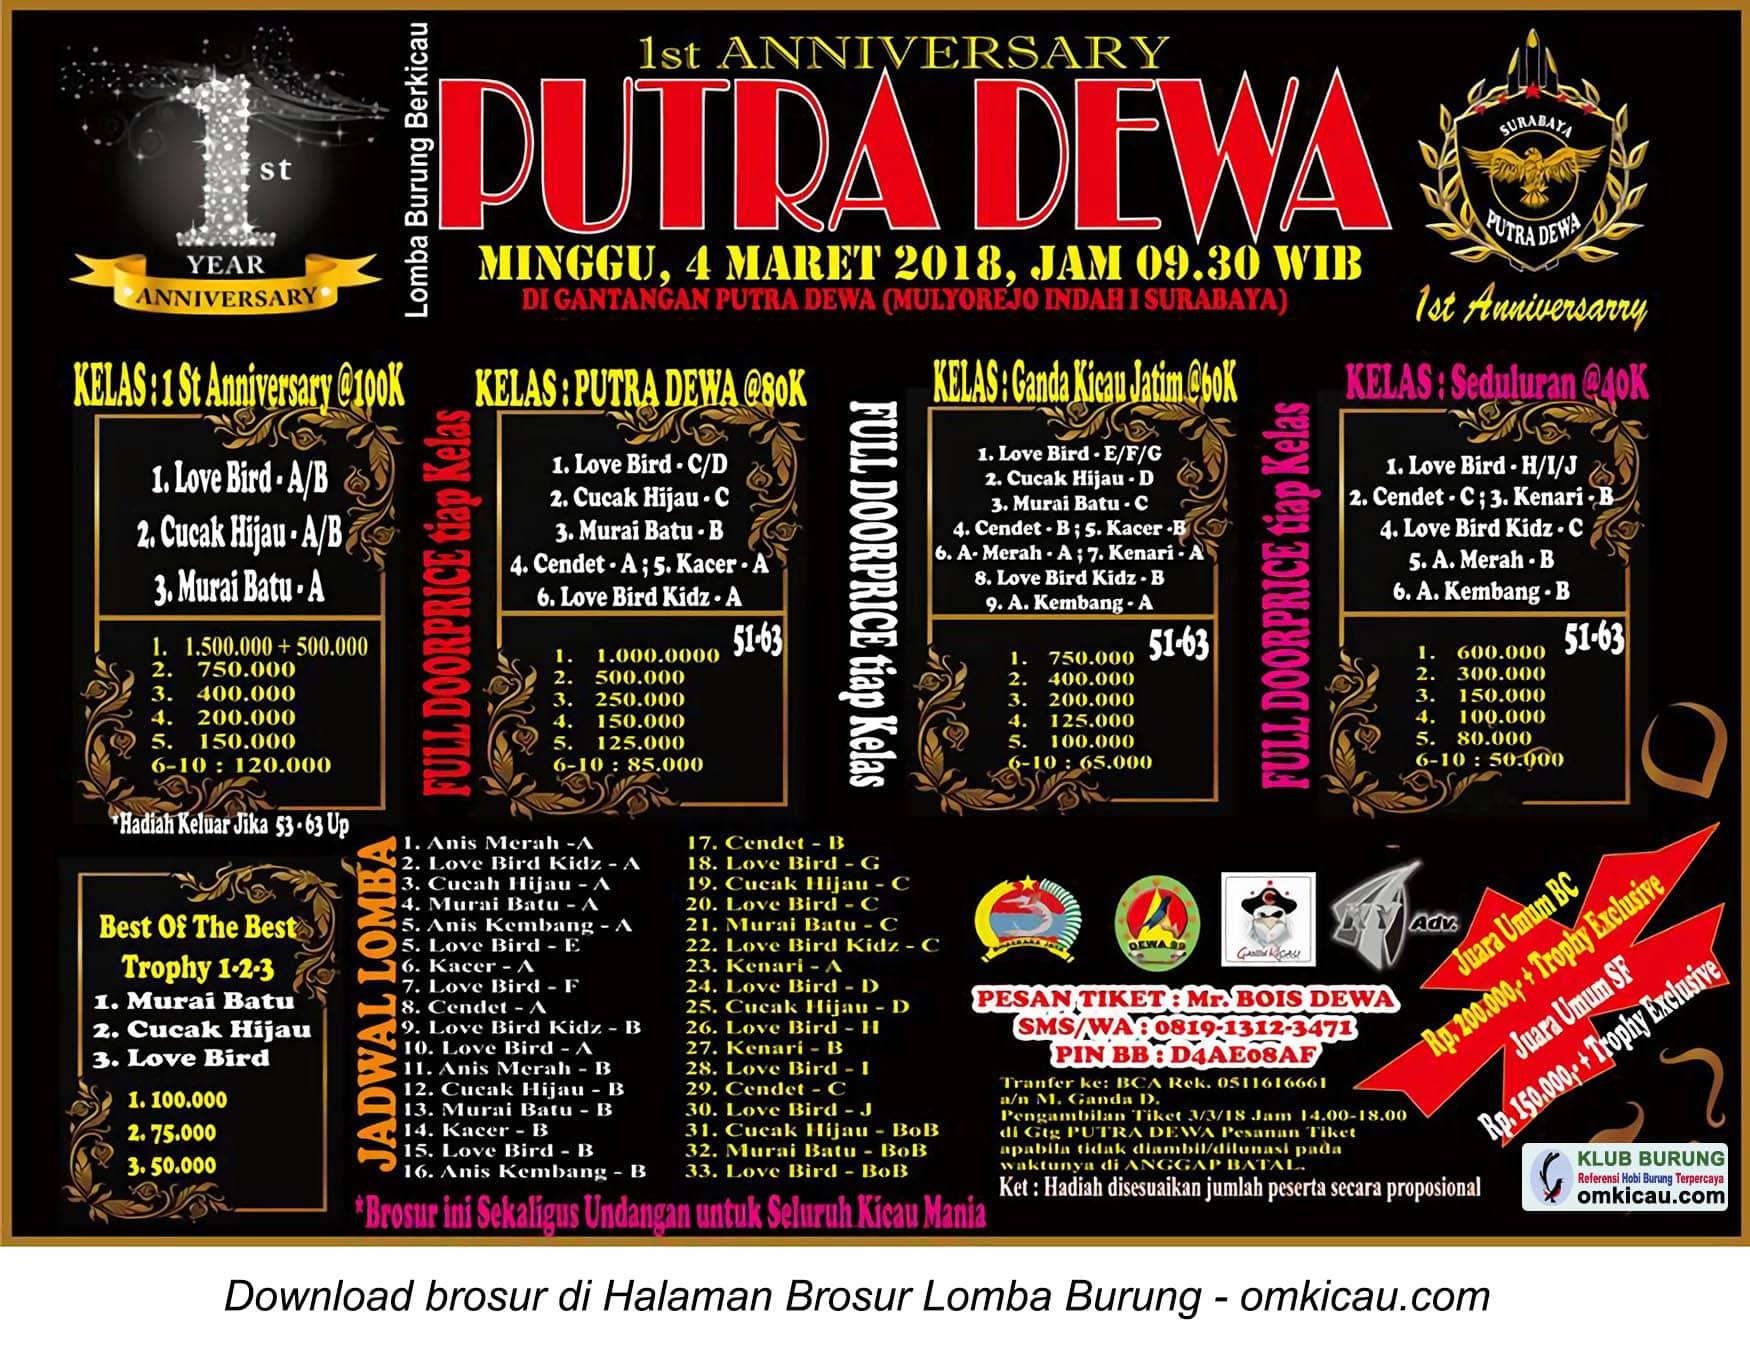 1st Anniversary Putra Dewa Surabaya